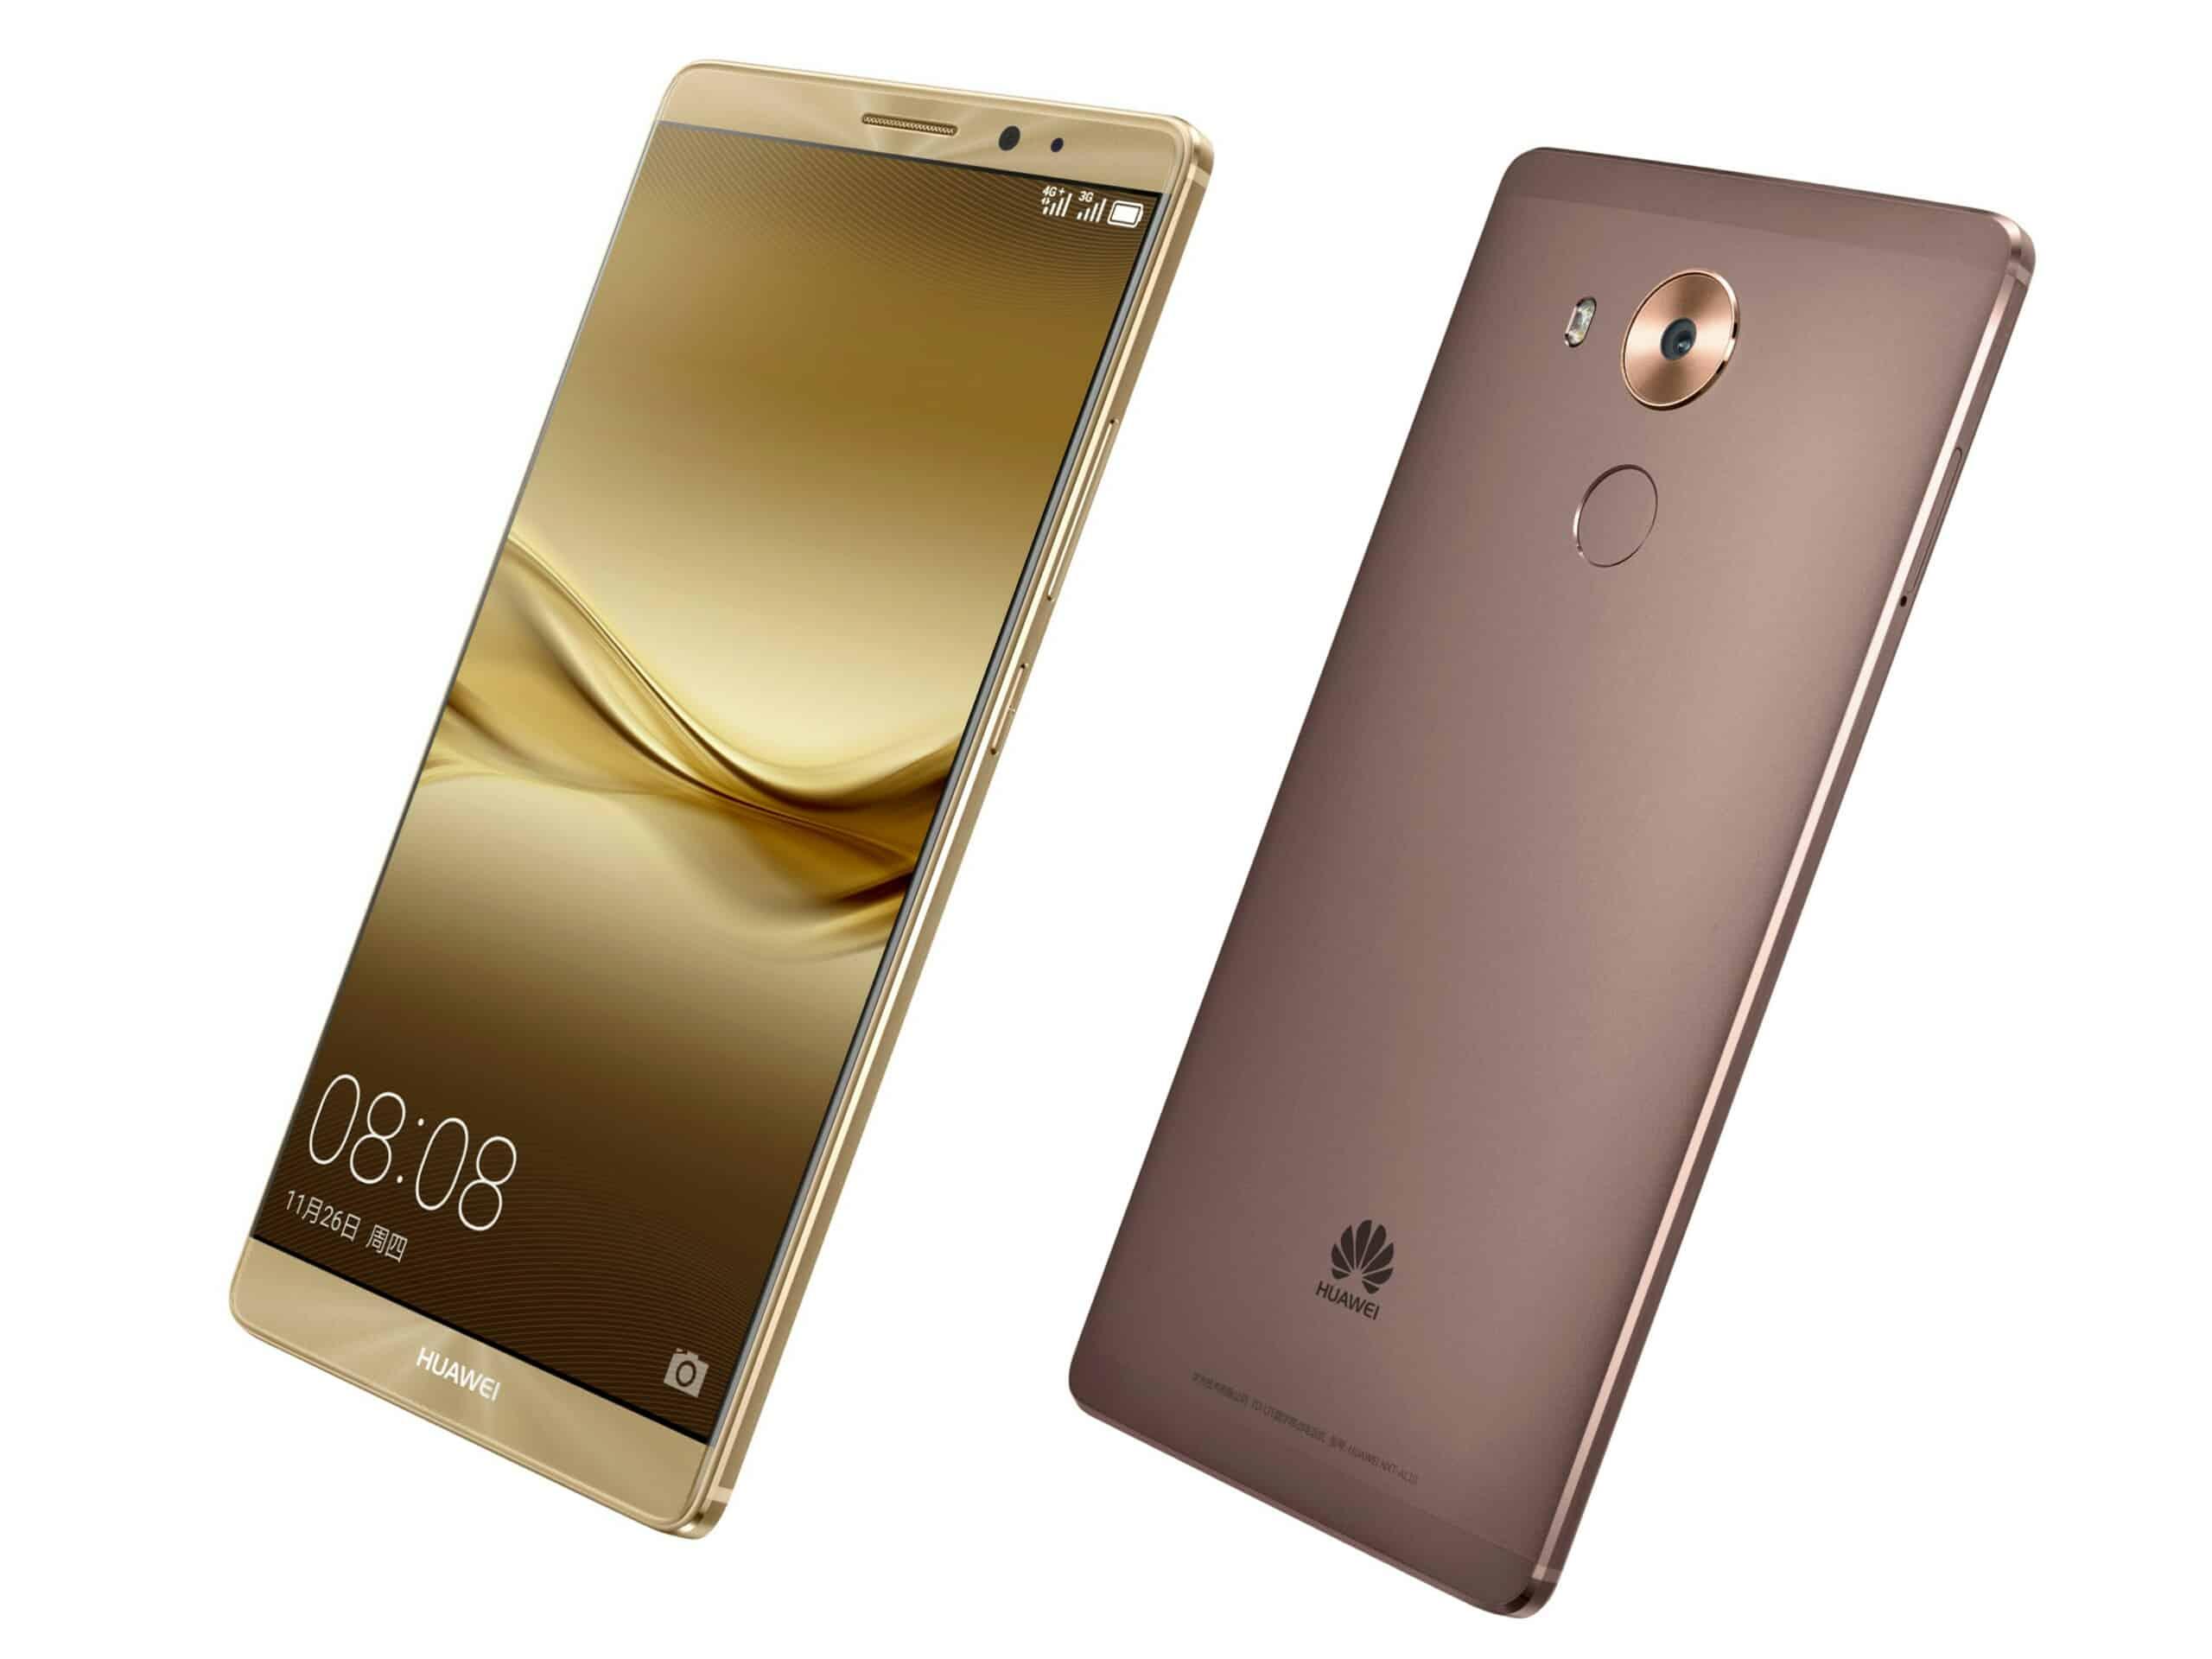 Huawei-Mate-8-1 مراجعة Huawei Mate 8: لعشاق الهواتف الراقية الكبيرة